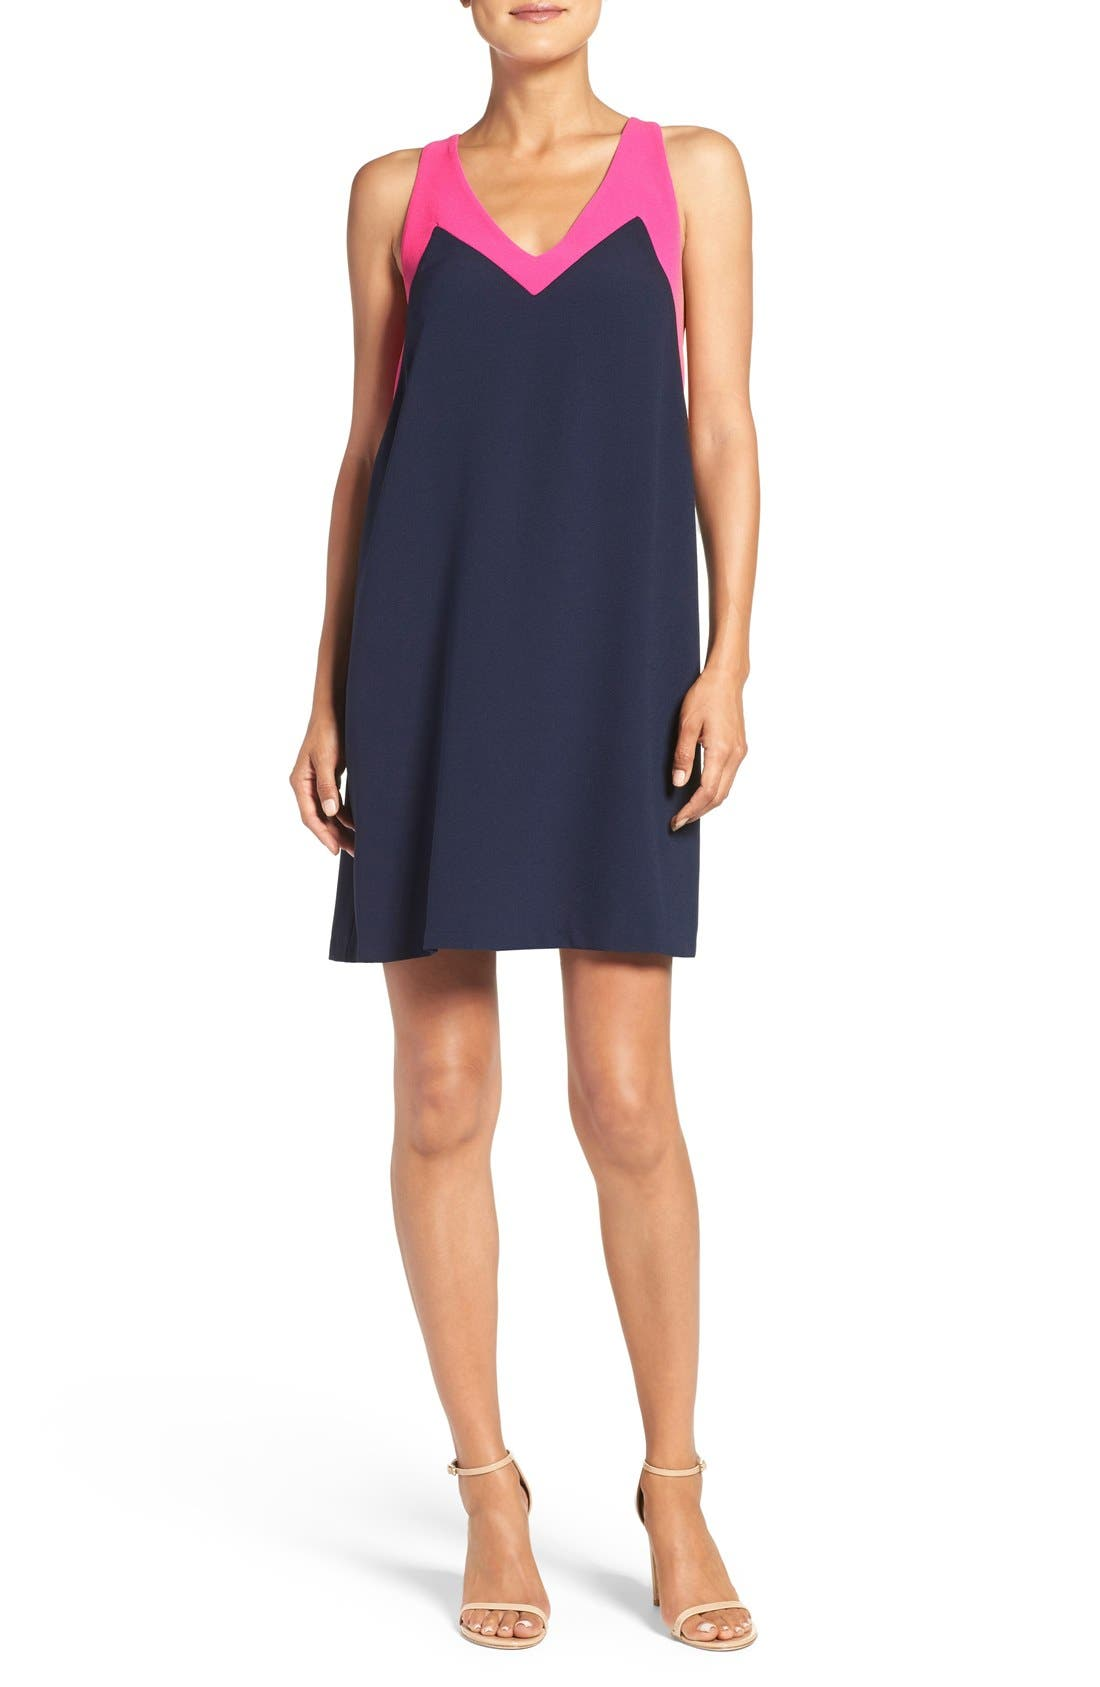 Main Image - Felicity & Coco Katy Colorblock Shift Dress (Regular & Petite) (Nordstrom Exclusive)